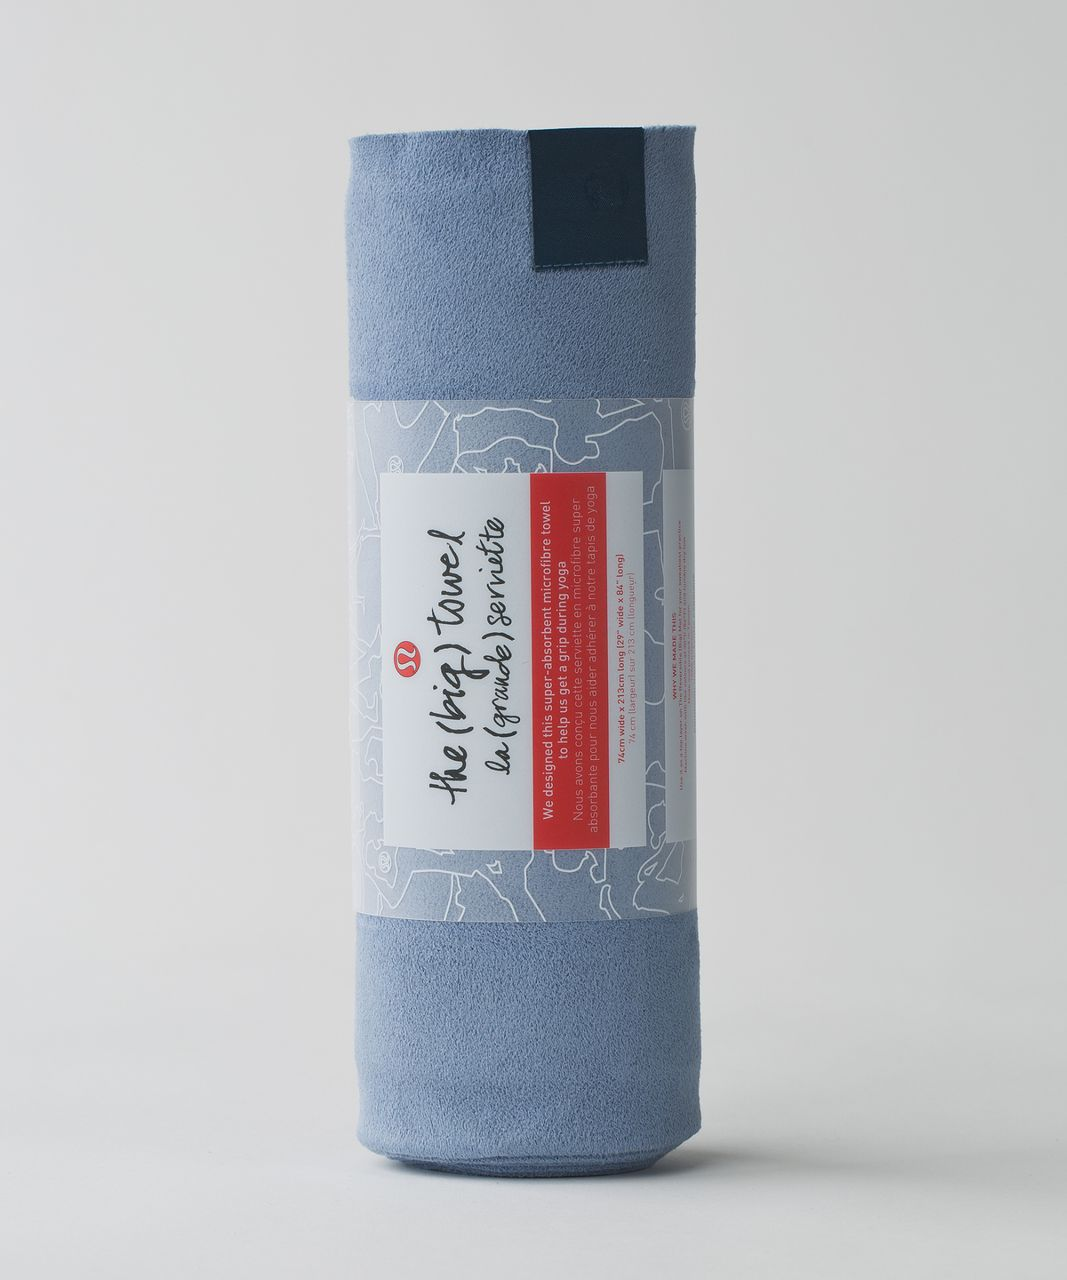 Lululemon The (Big) Towel - Tempest Blue